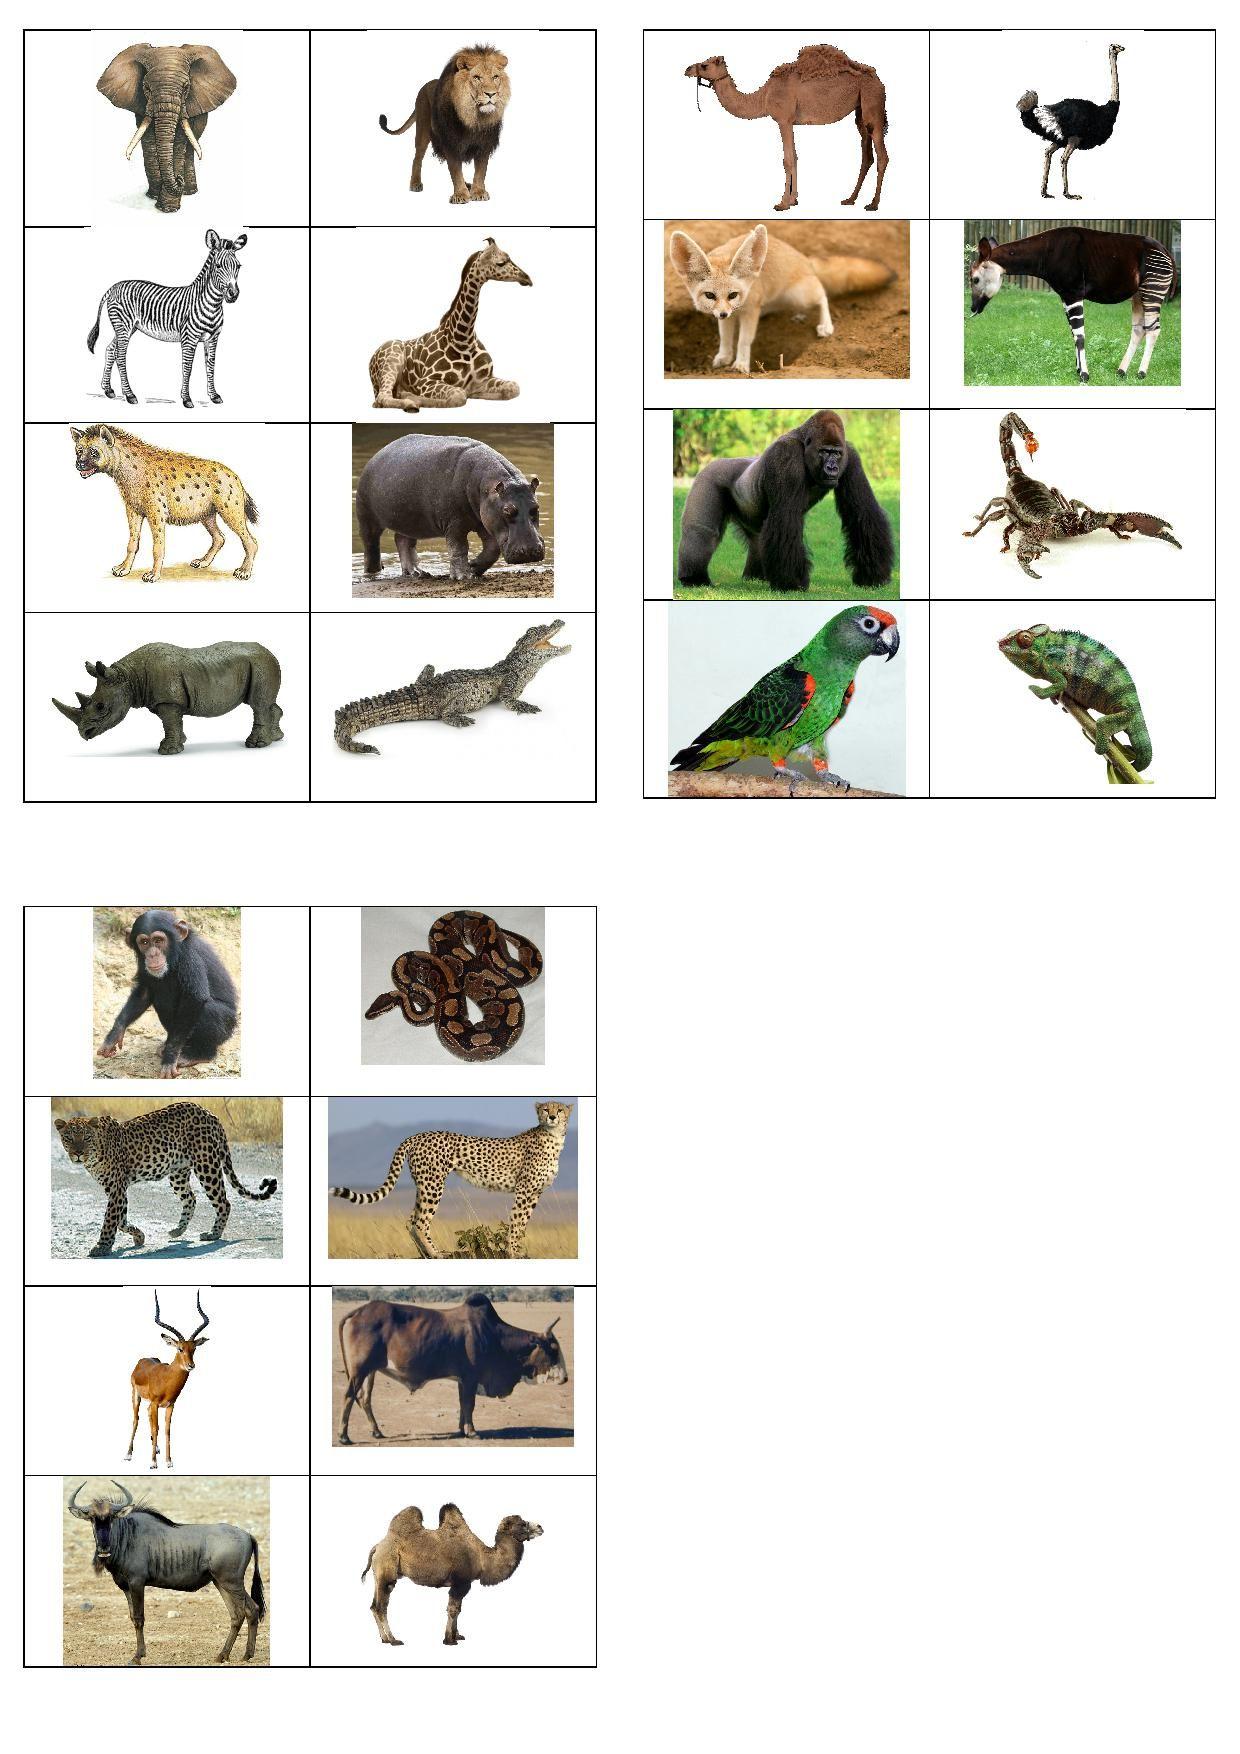 Imagiers Imagier Animaux Animaux Afrique Images Animaux Sauvages